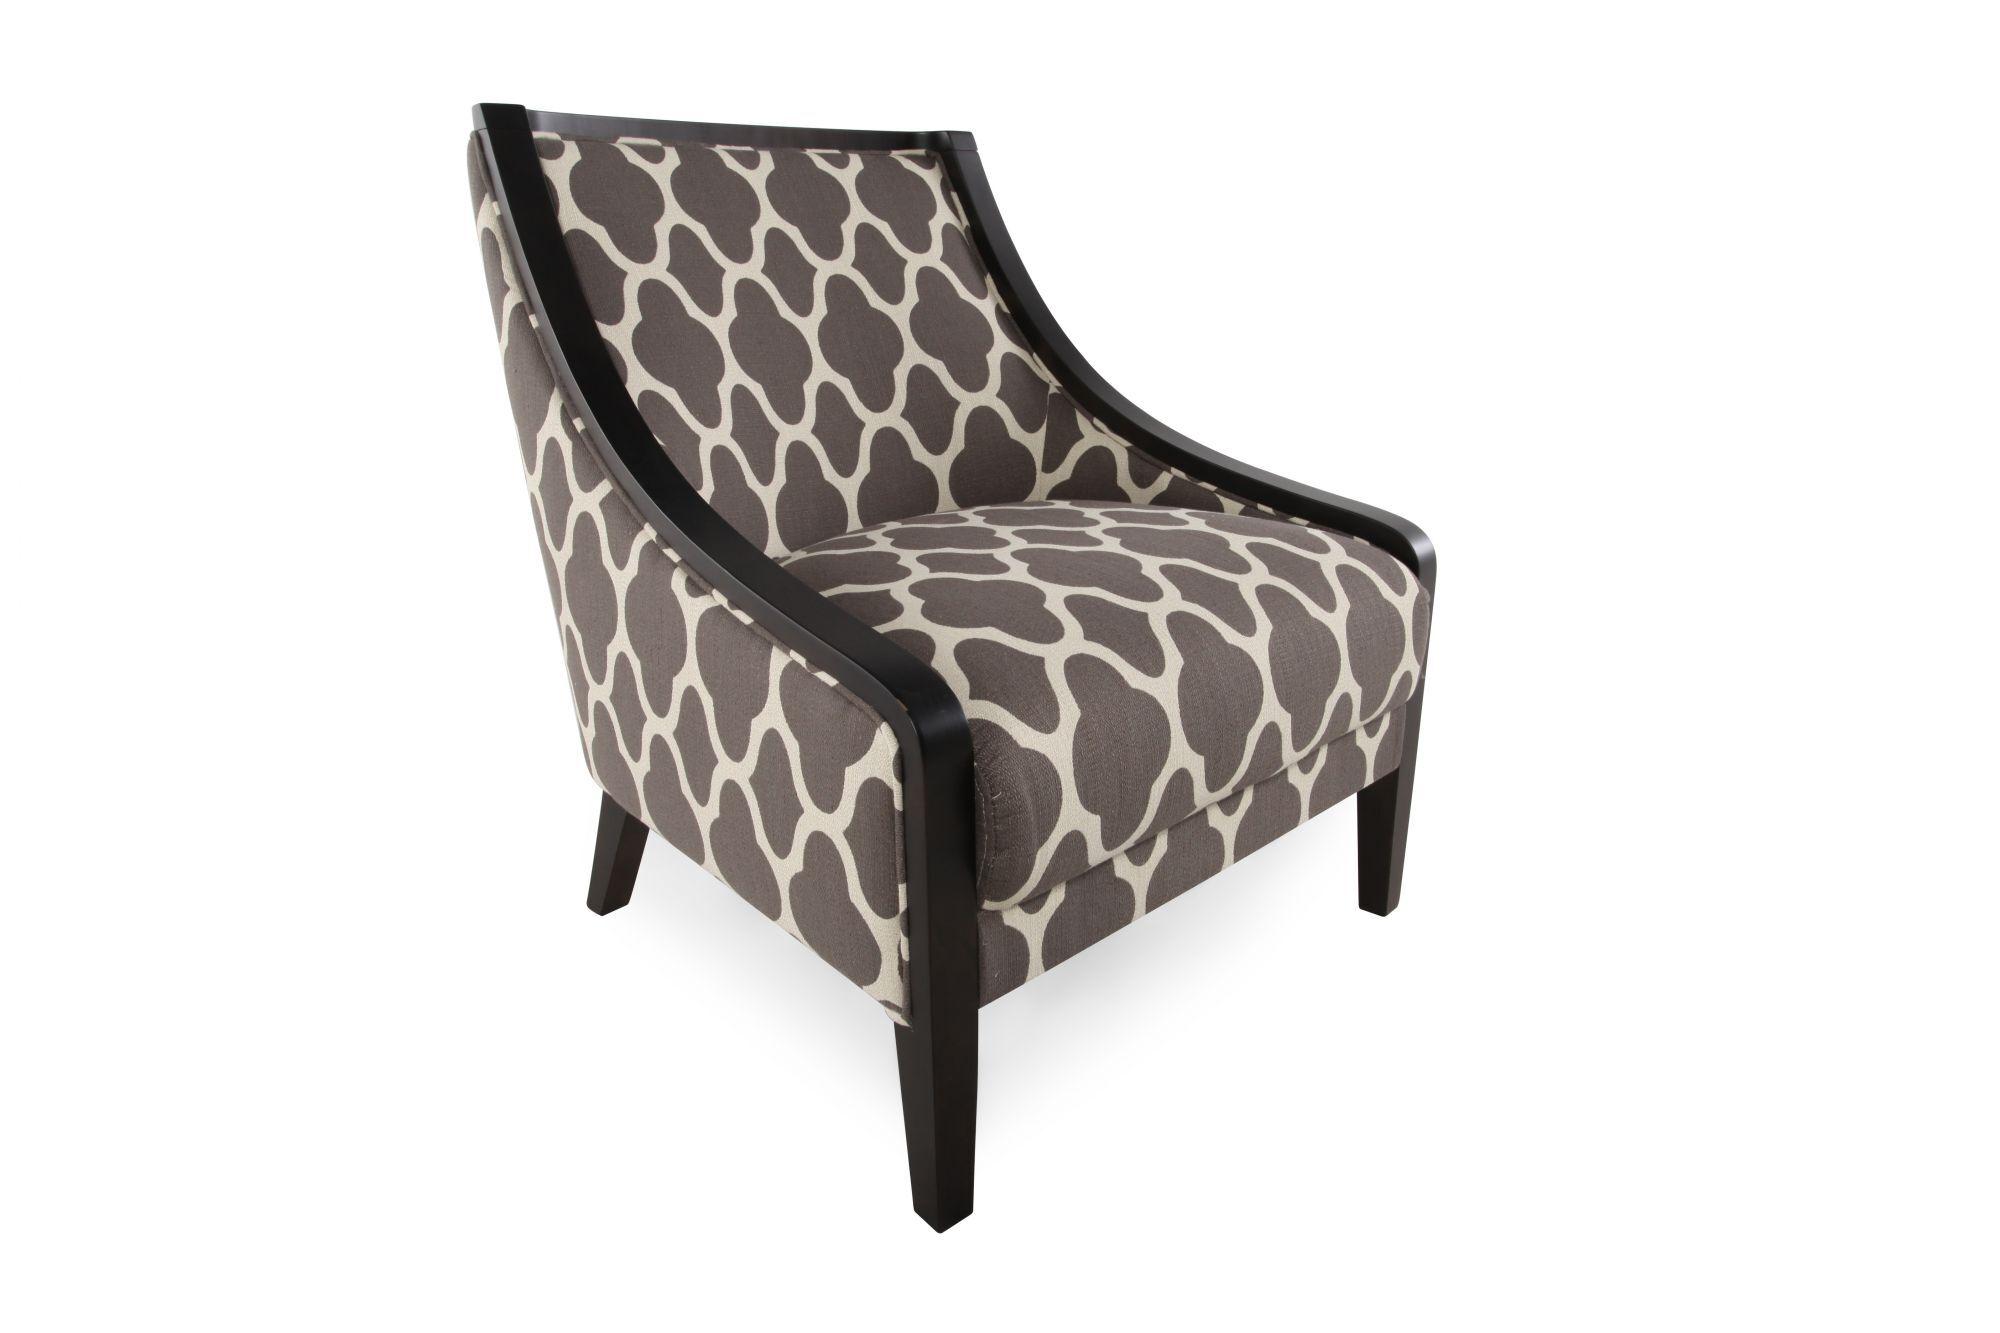 ... Quatrefoil Patterned Contemporary 28u0026quot; Accent Chair In ...